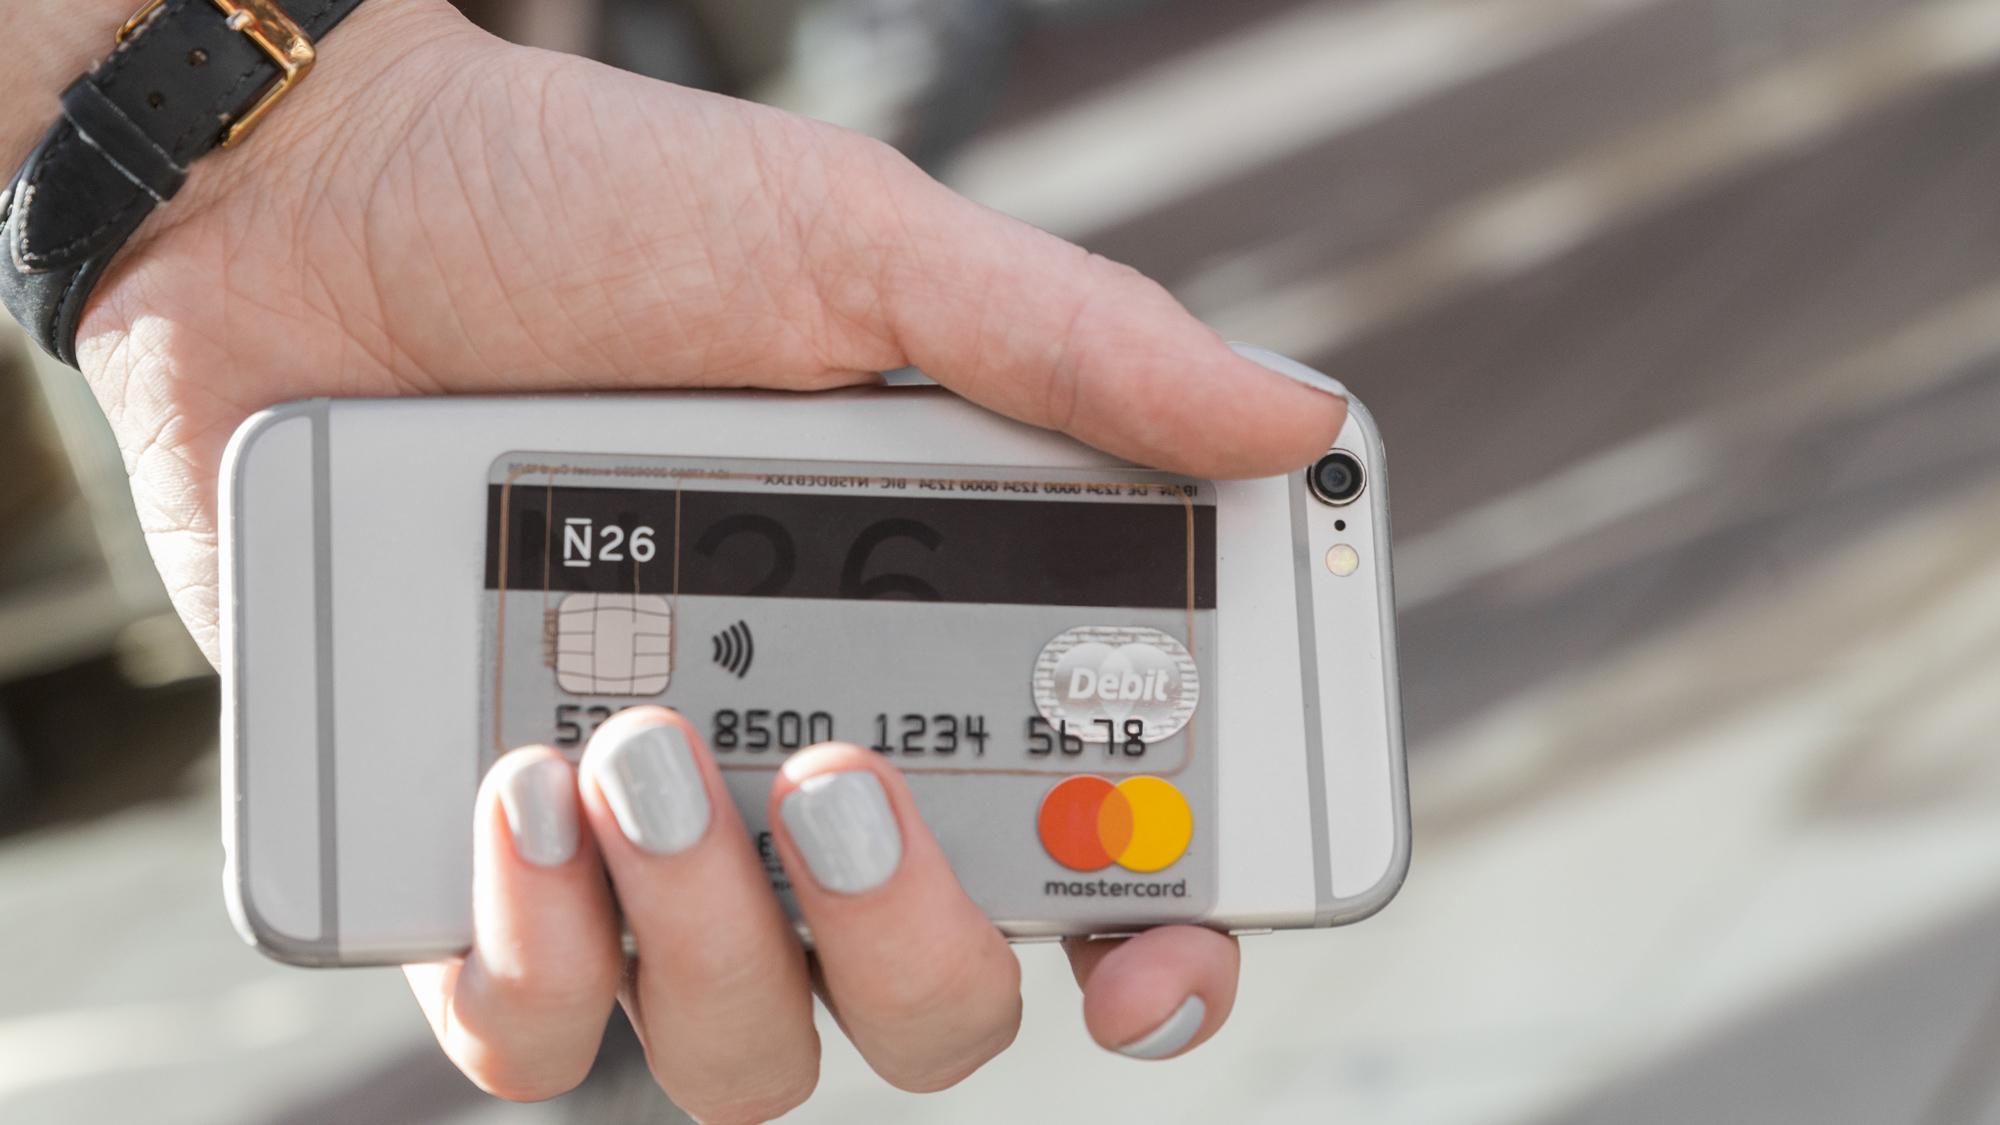 Smartphone mit Kreditkarte/N26